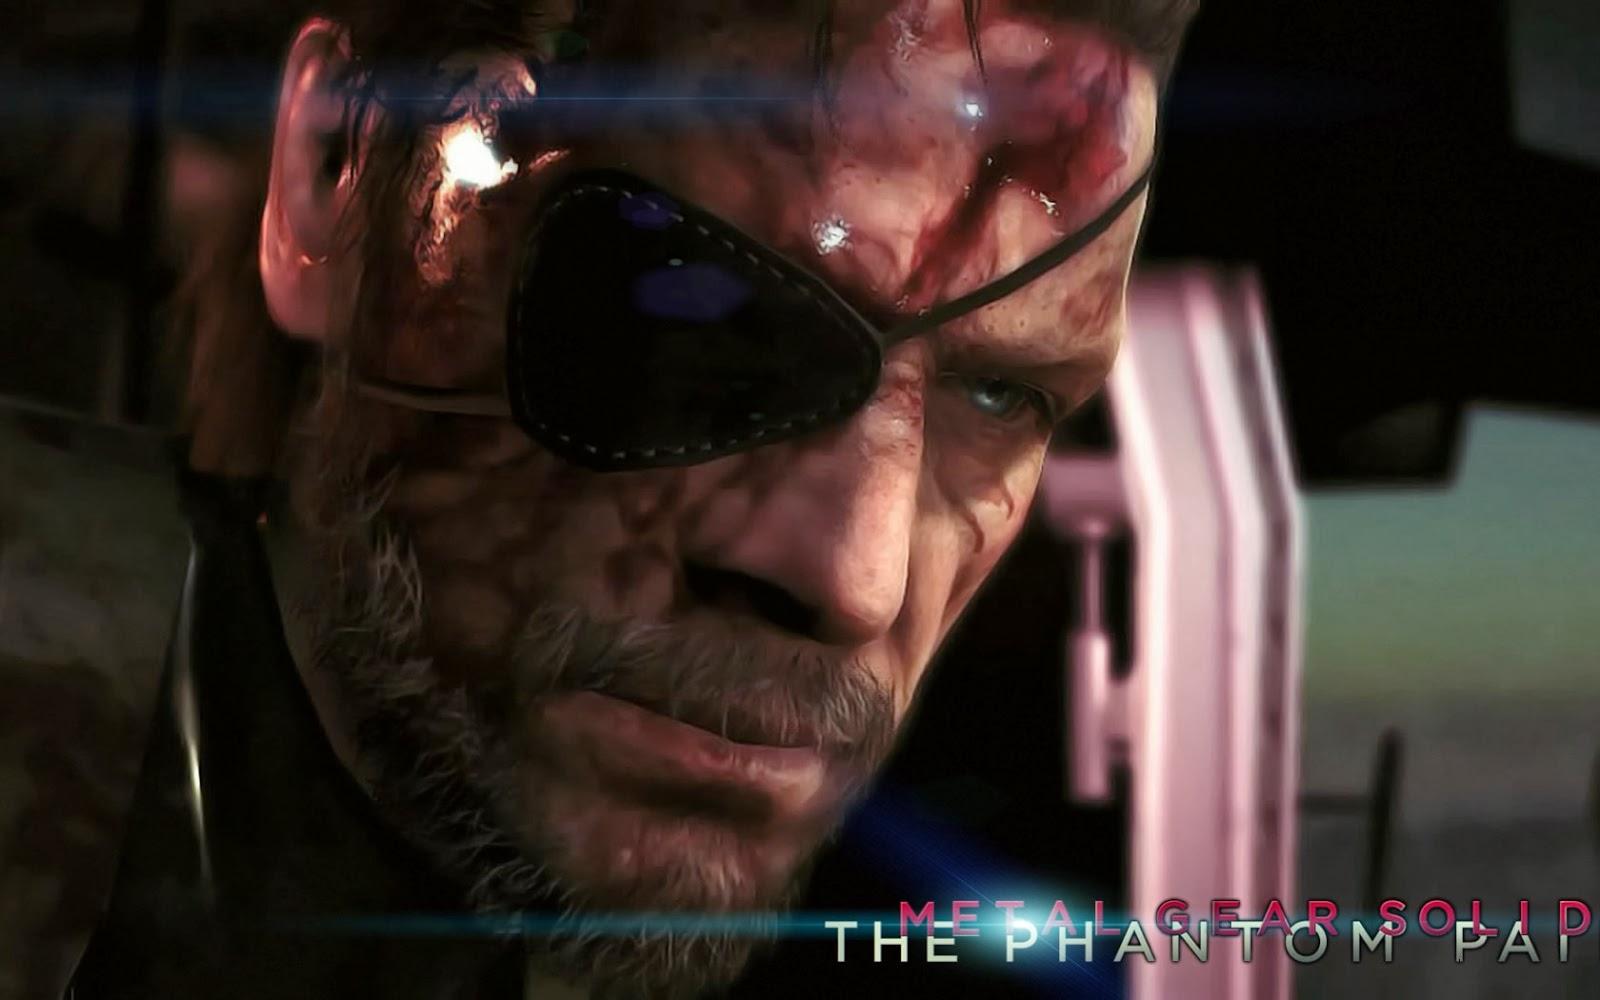 Metal Gear Solid 5 The Phantom Pain Wallpaper